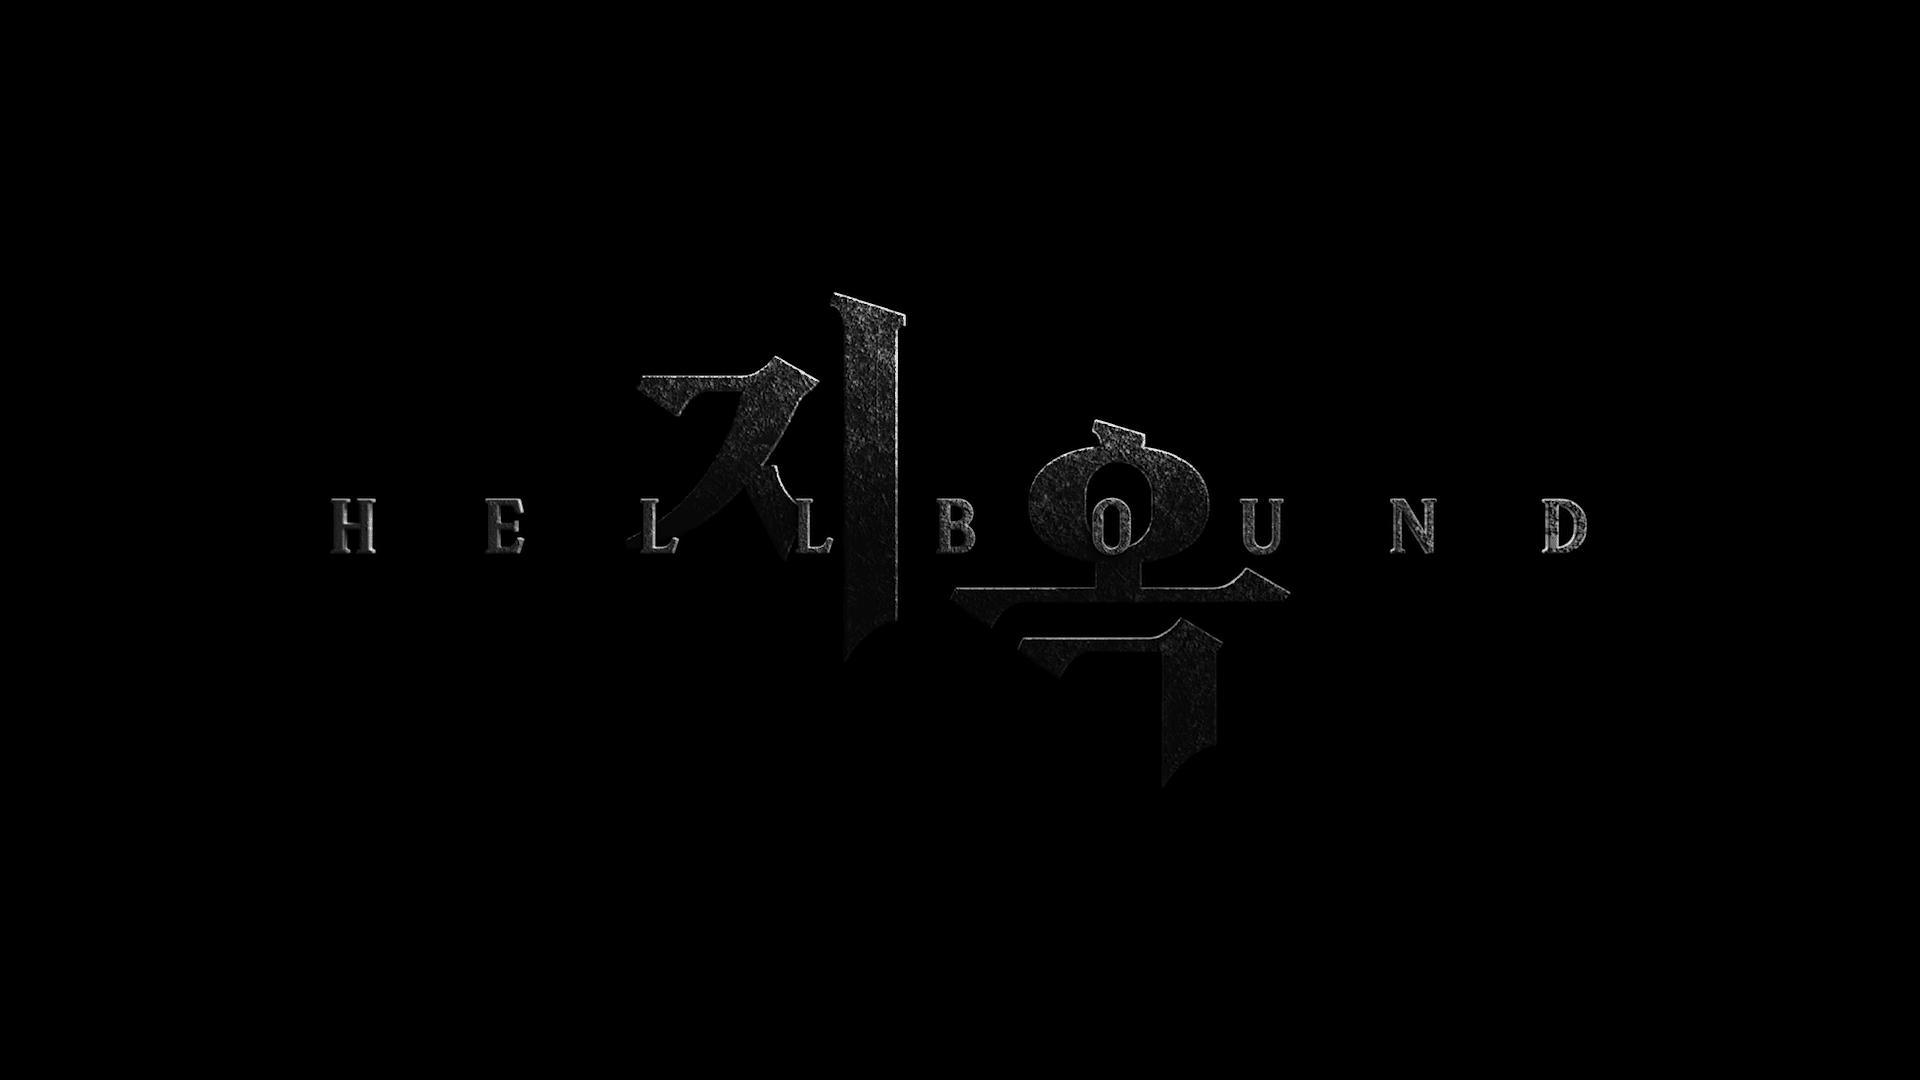 Hellbound Netflix Release Date, Cast List and Trailer